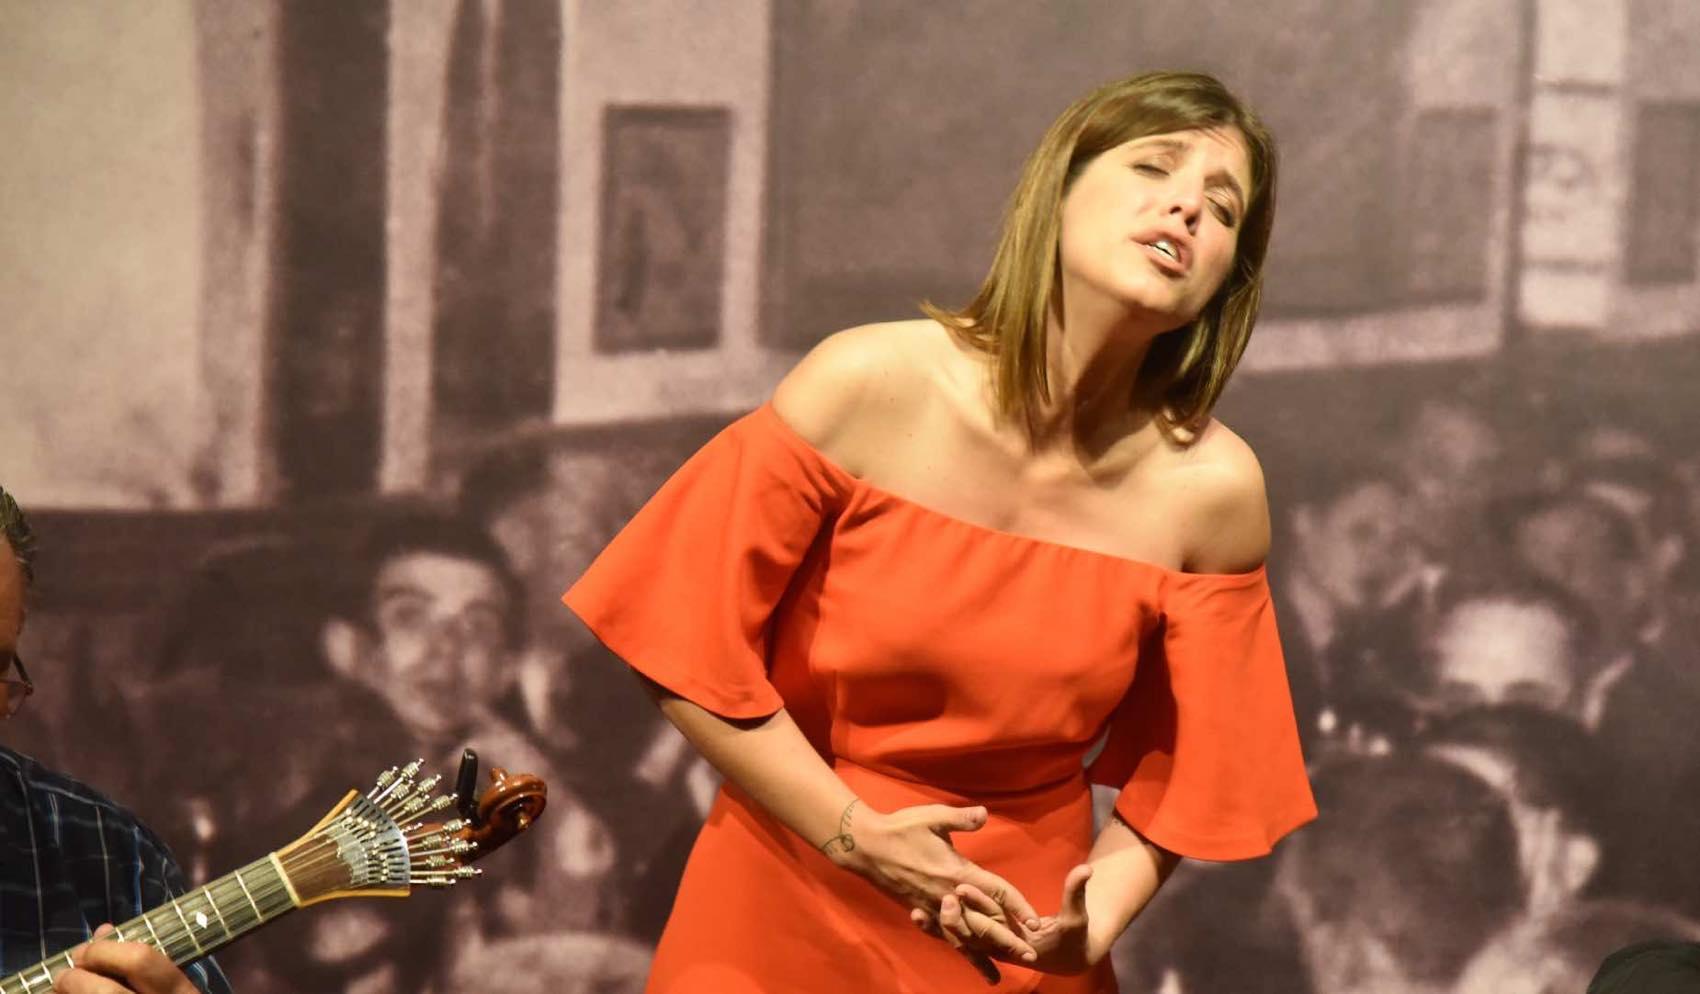 The Voice: Soulful singer Sara Goncalves performing Fado in Tavira